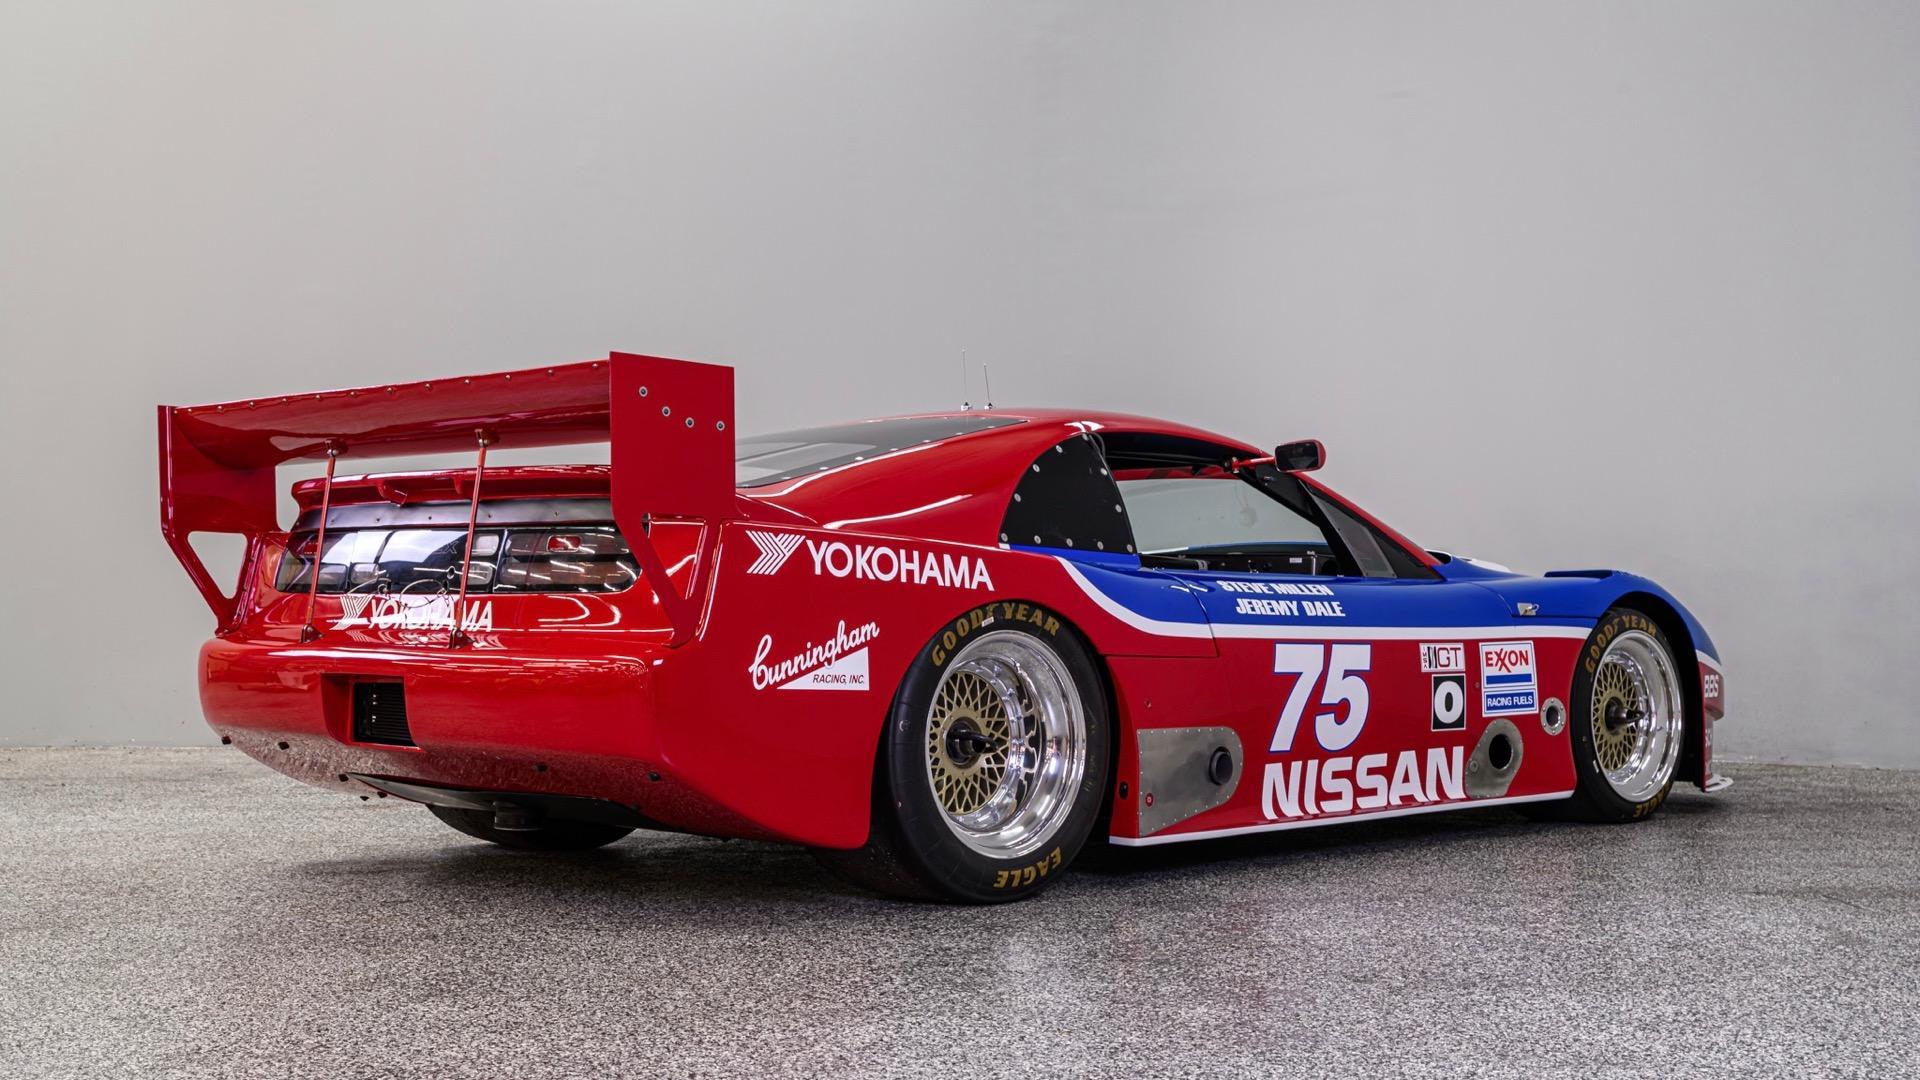 1990 nissan 300zx twin turbo imsa gto race car photo by bring a trailer 100791730 h